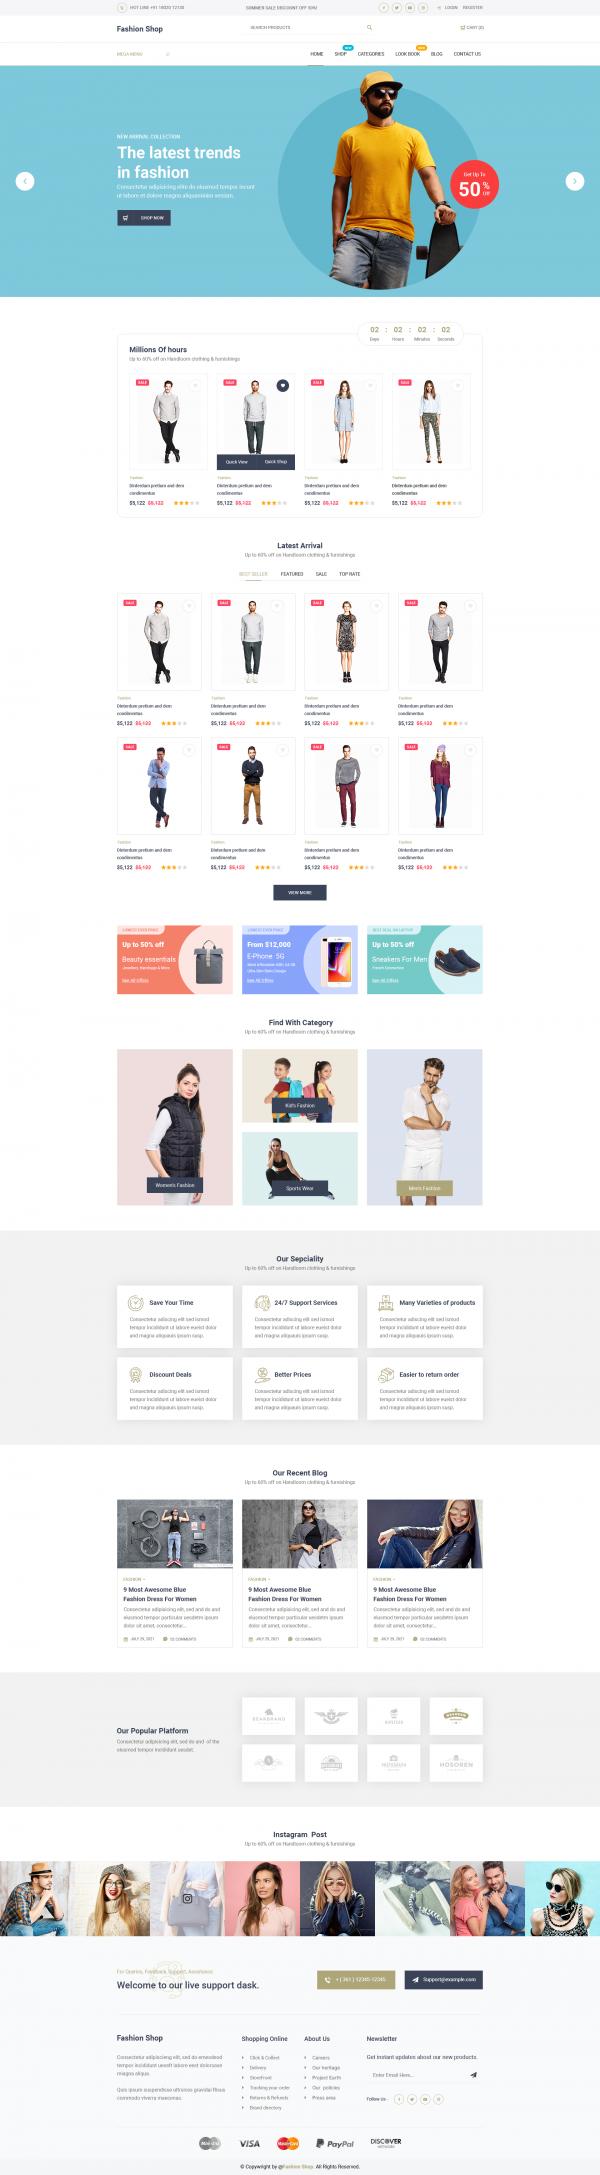 Clothing Store WordPress Theme